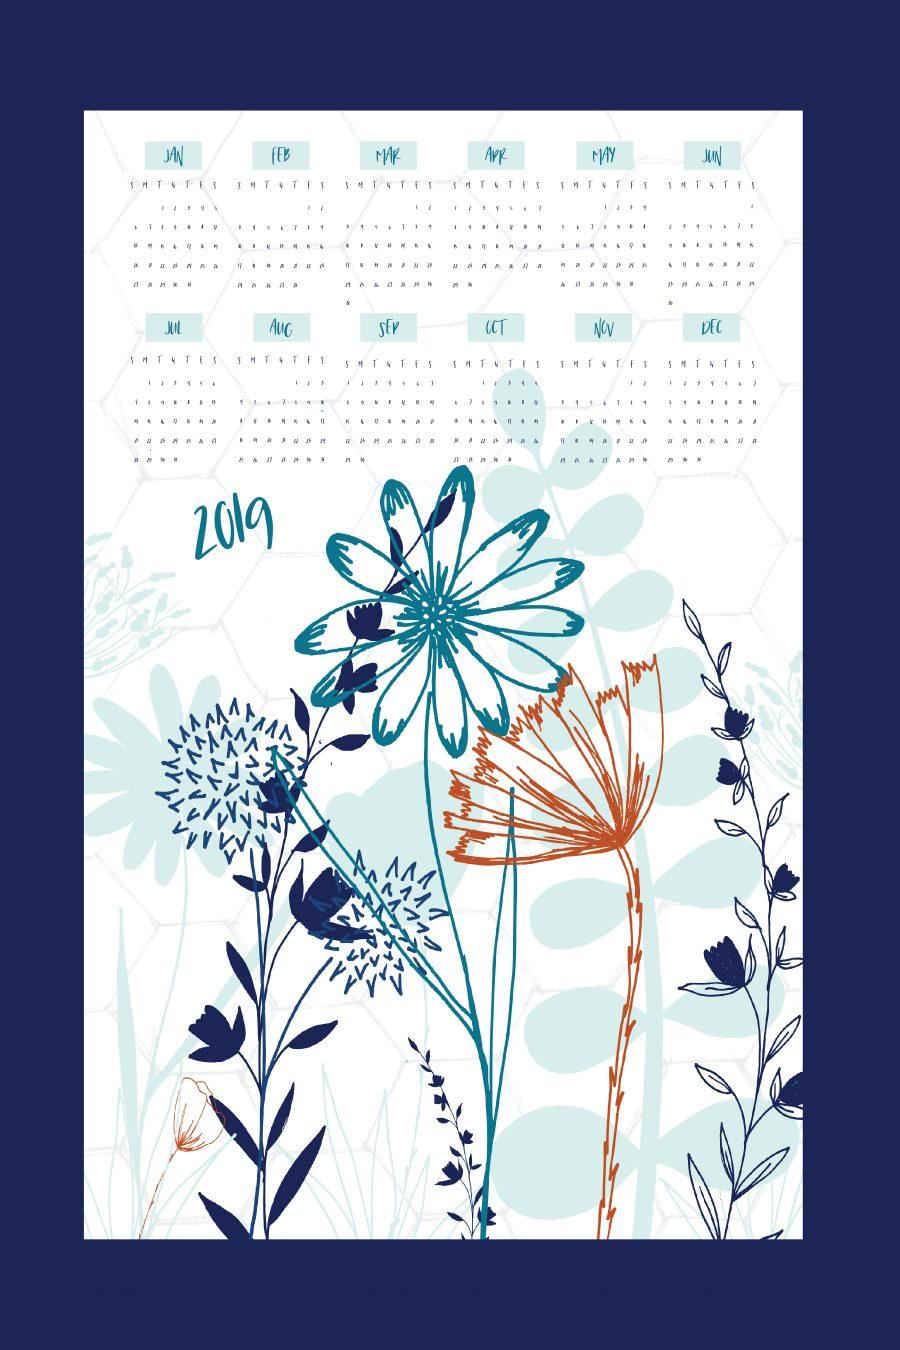 2019 Wildflower Tea Towel Calendar | Radiant Home Studio